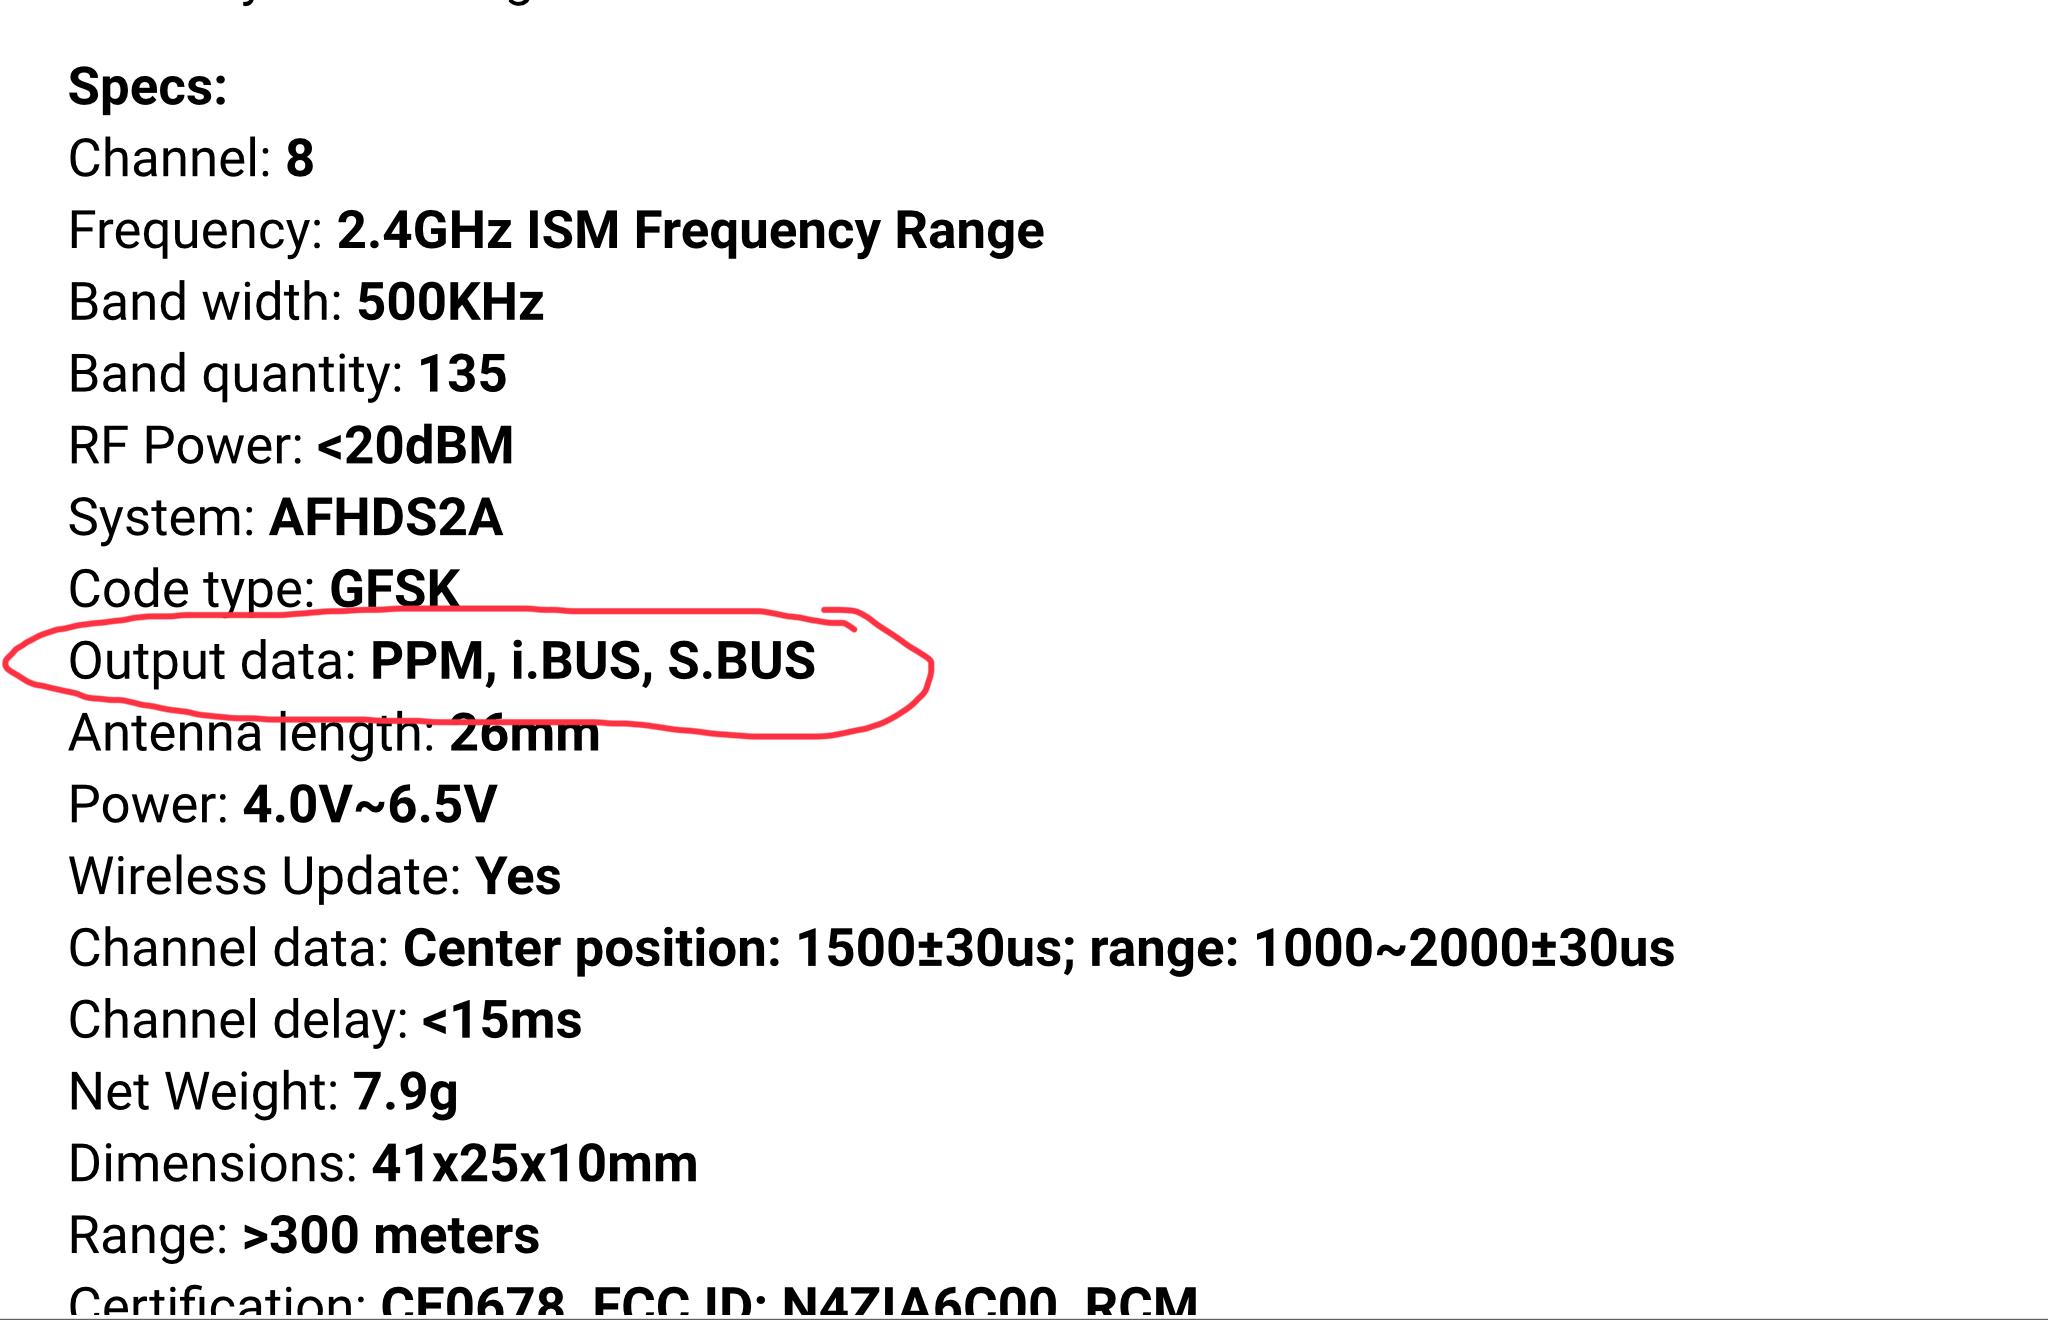 76AC2D0E-3B63-4DC0-9F40-CF6A70CC07BC.jpeg